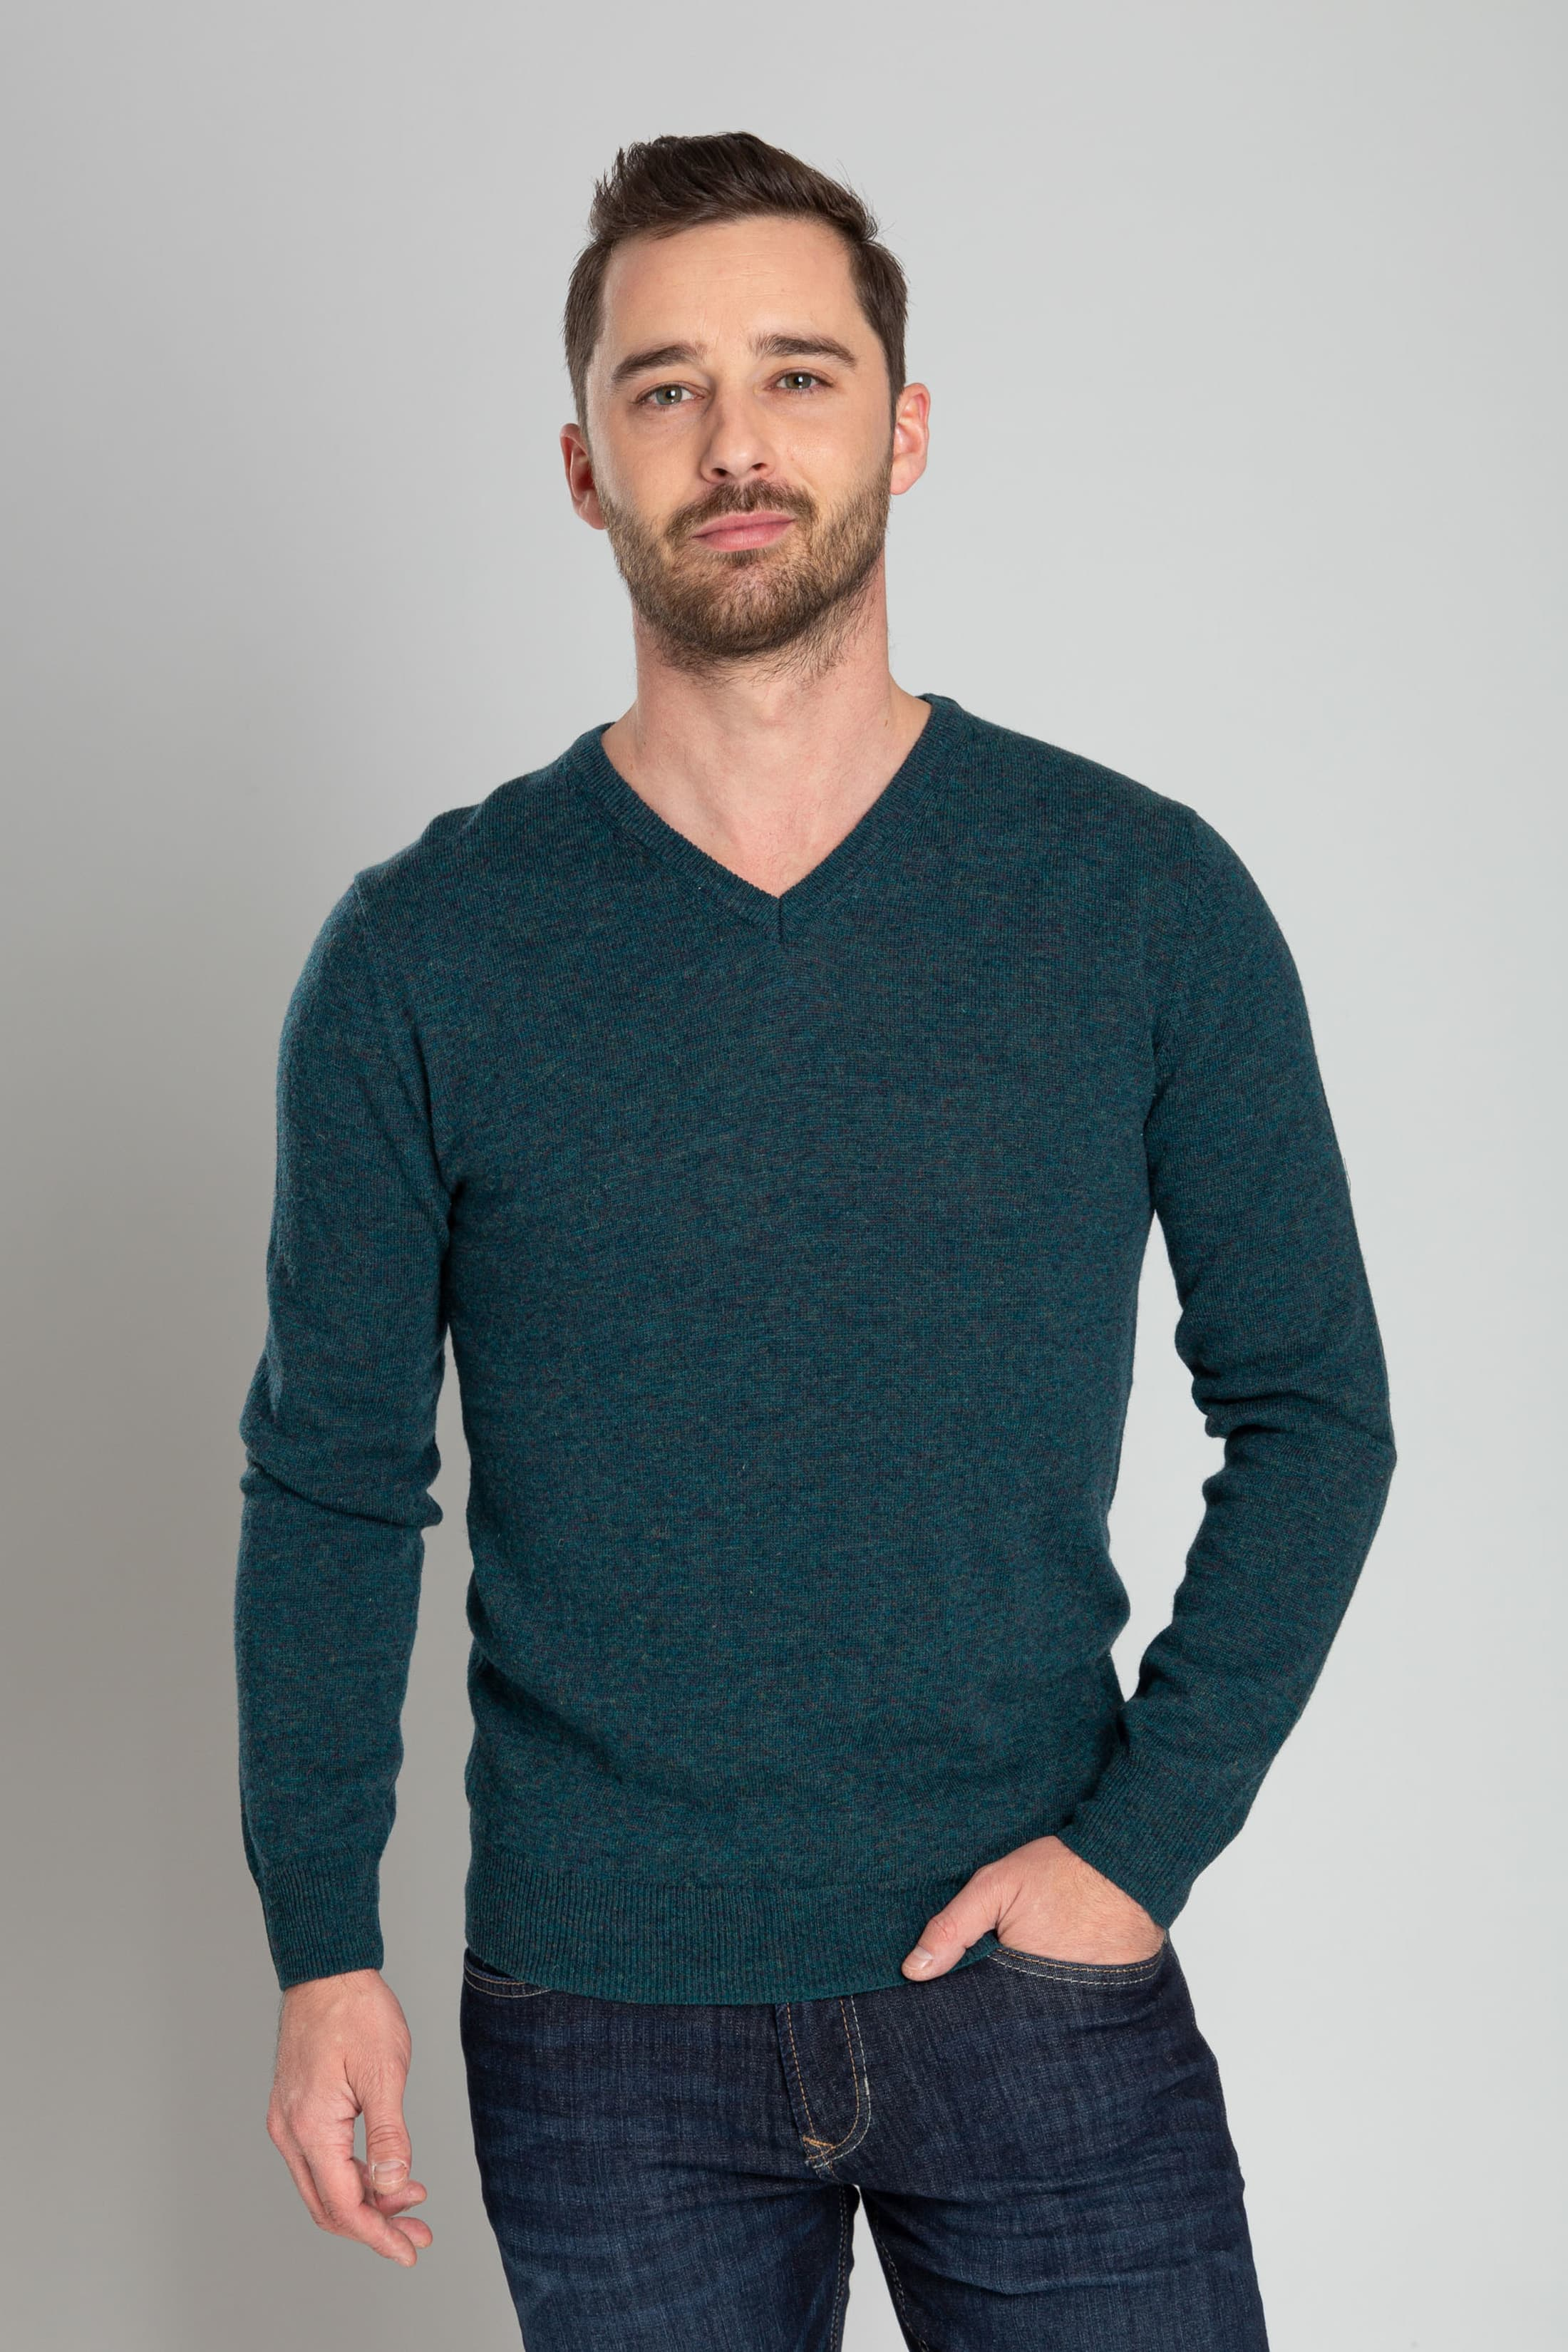 Suitable Pullover V-Hals Lamswol Groen foto 1